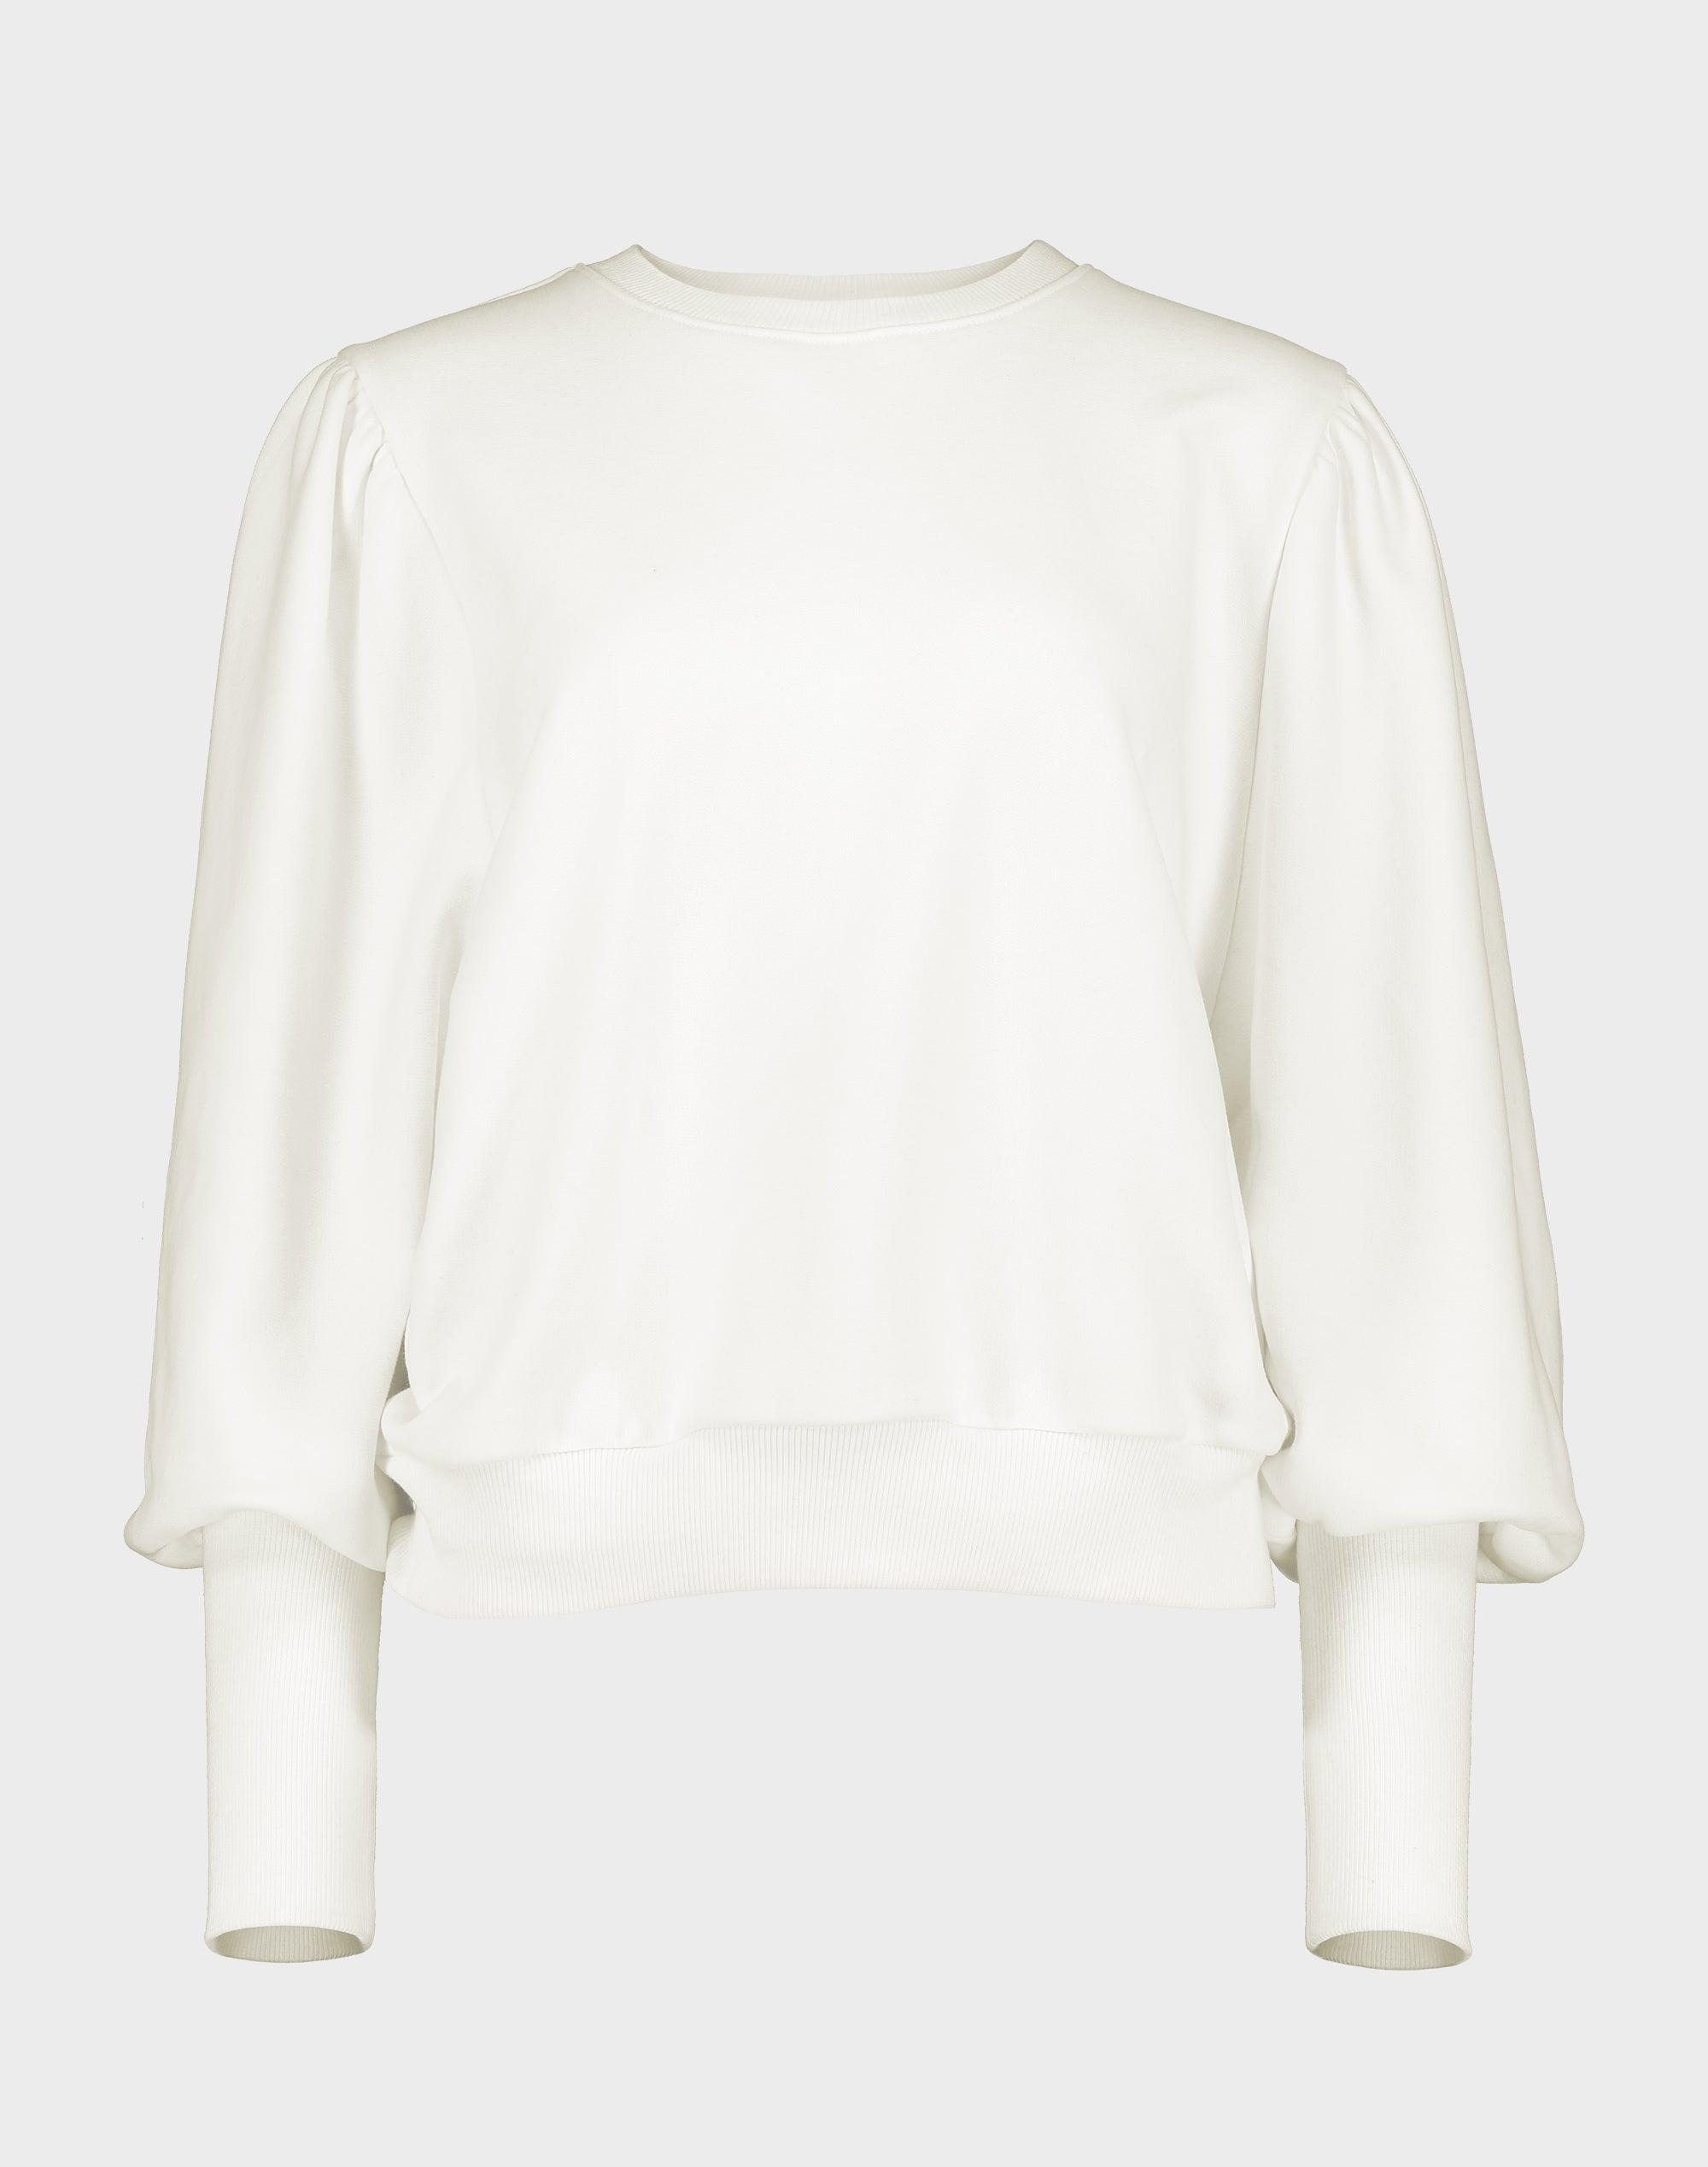 Becca Sweatshirt